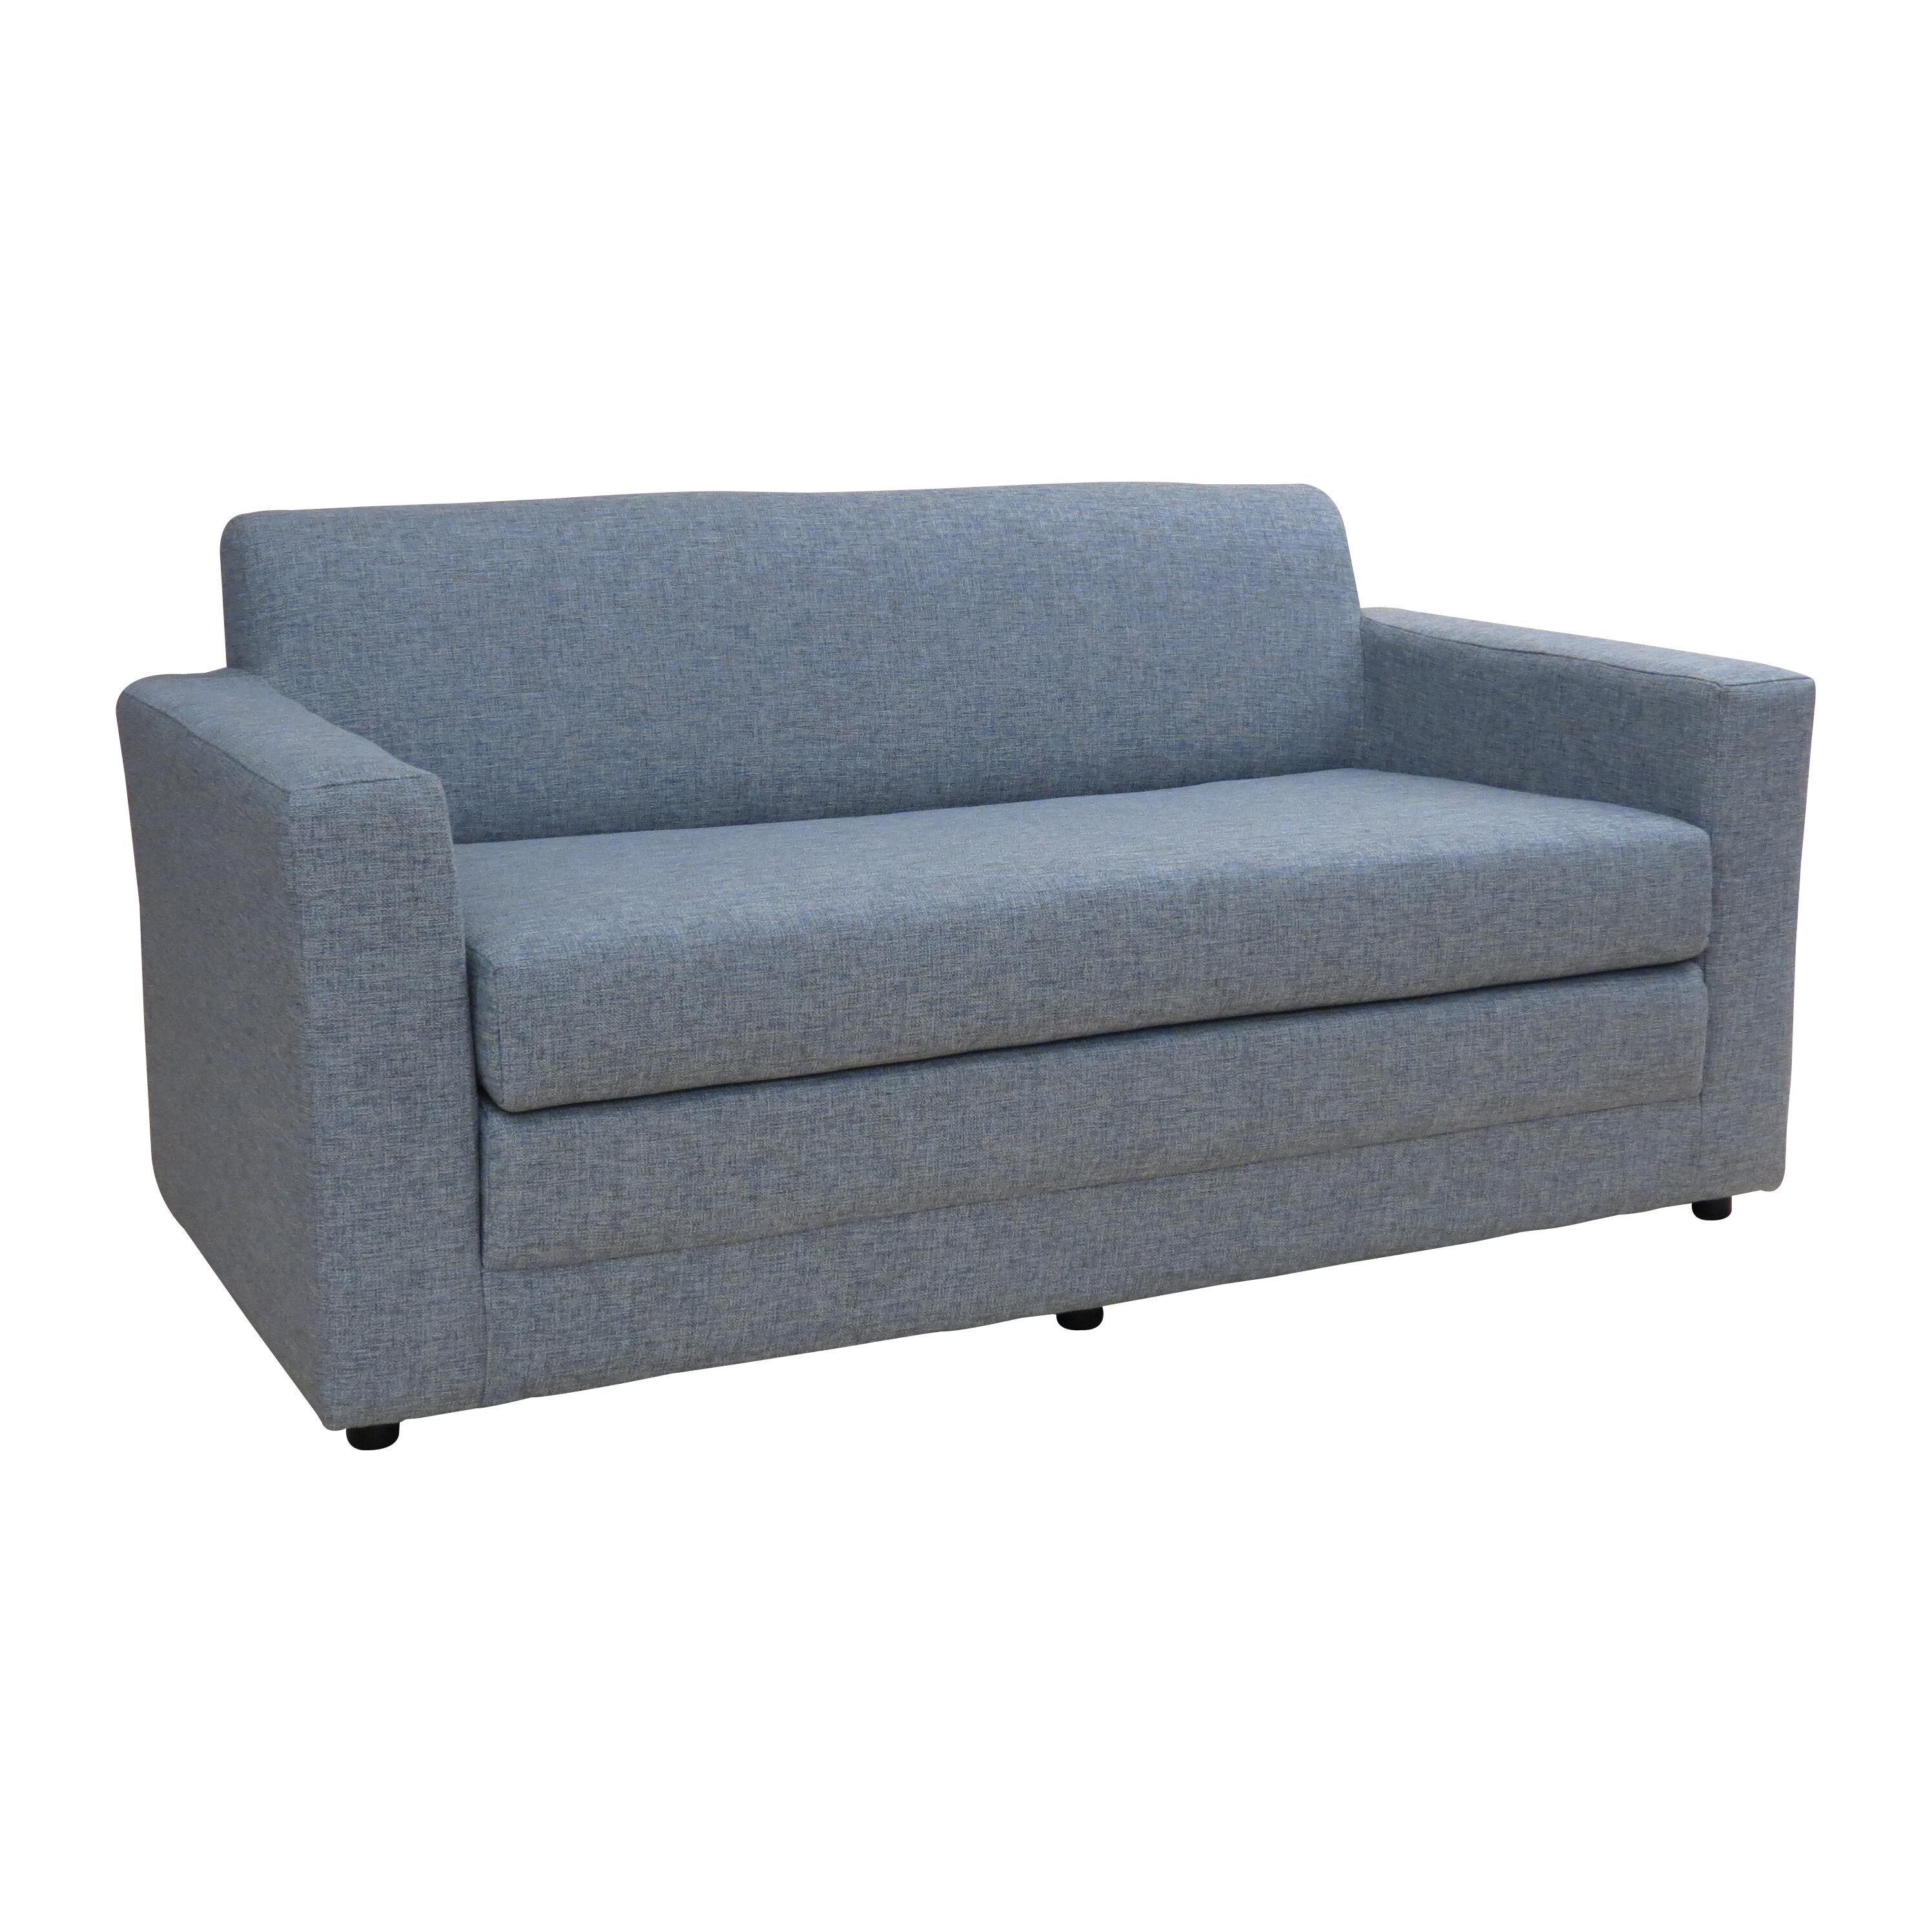 Captivating Fox Hill Trading Netto Sleeper Sofa U0026 Reviews | Wayfair